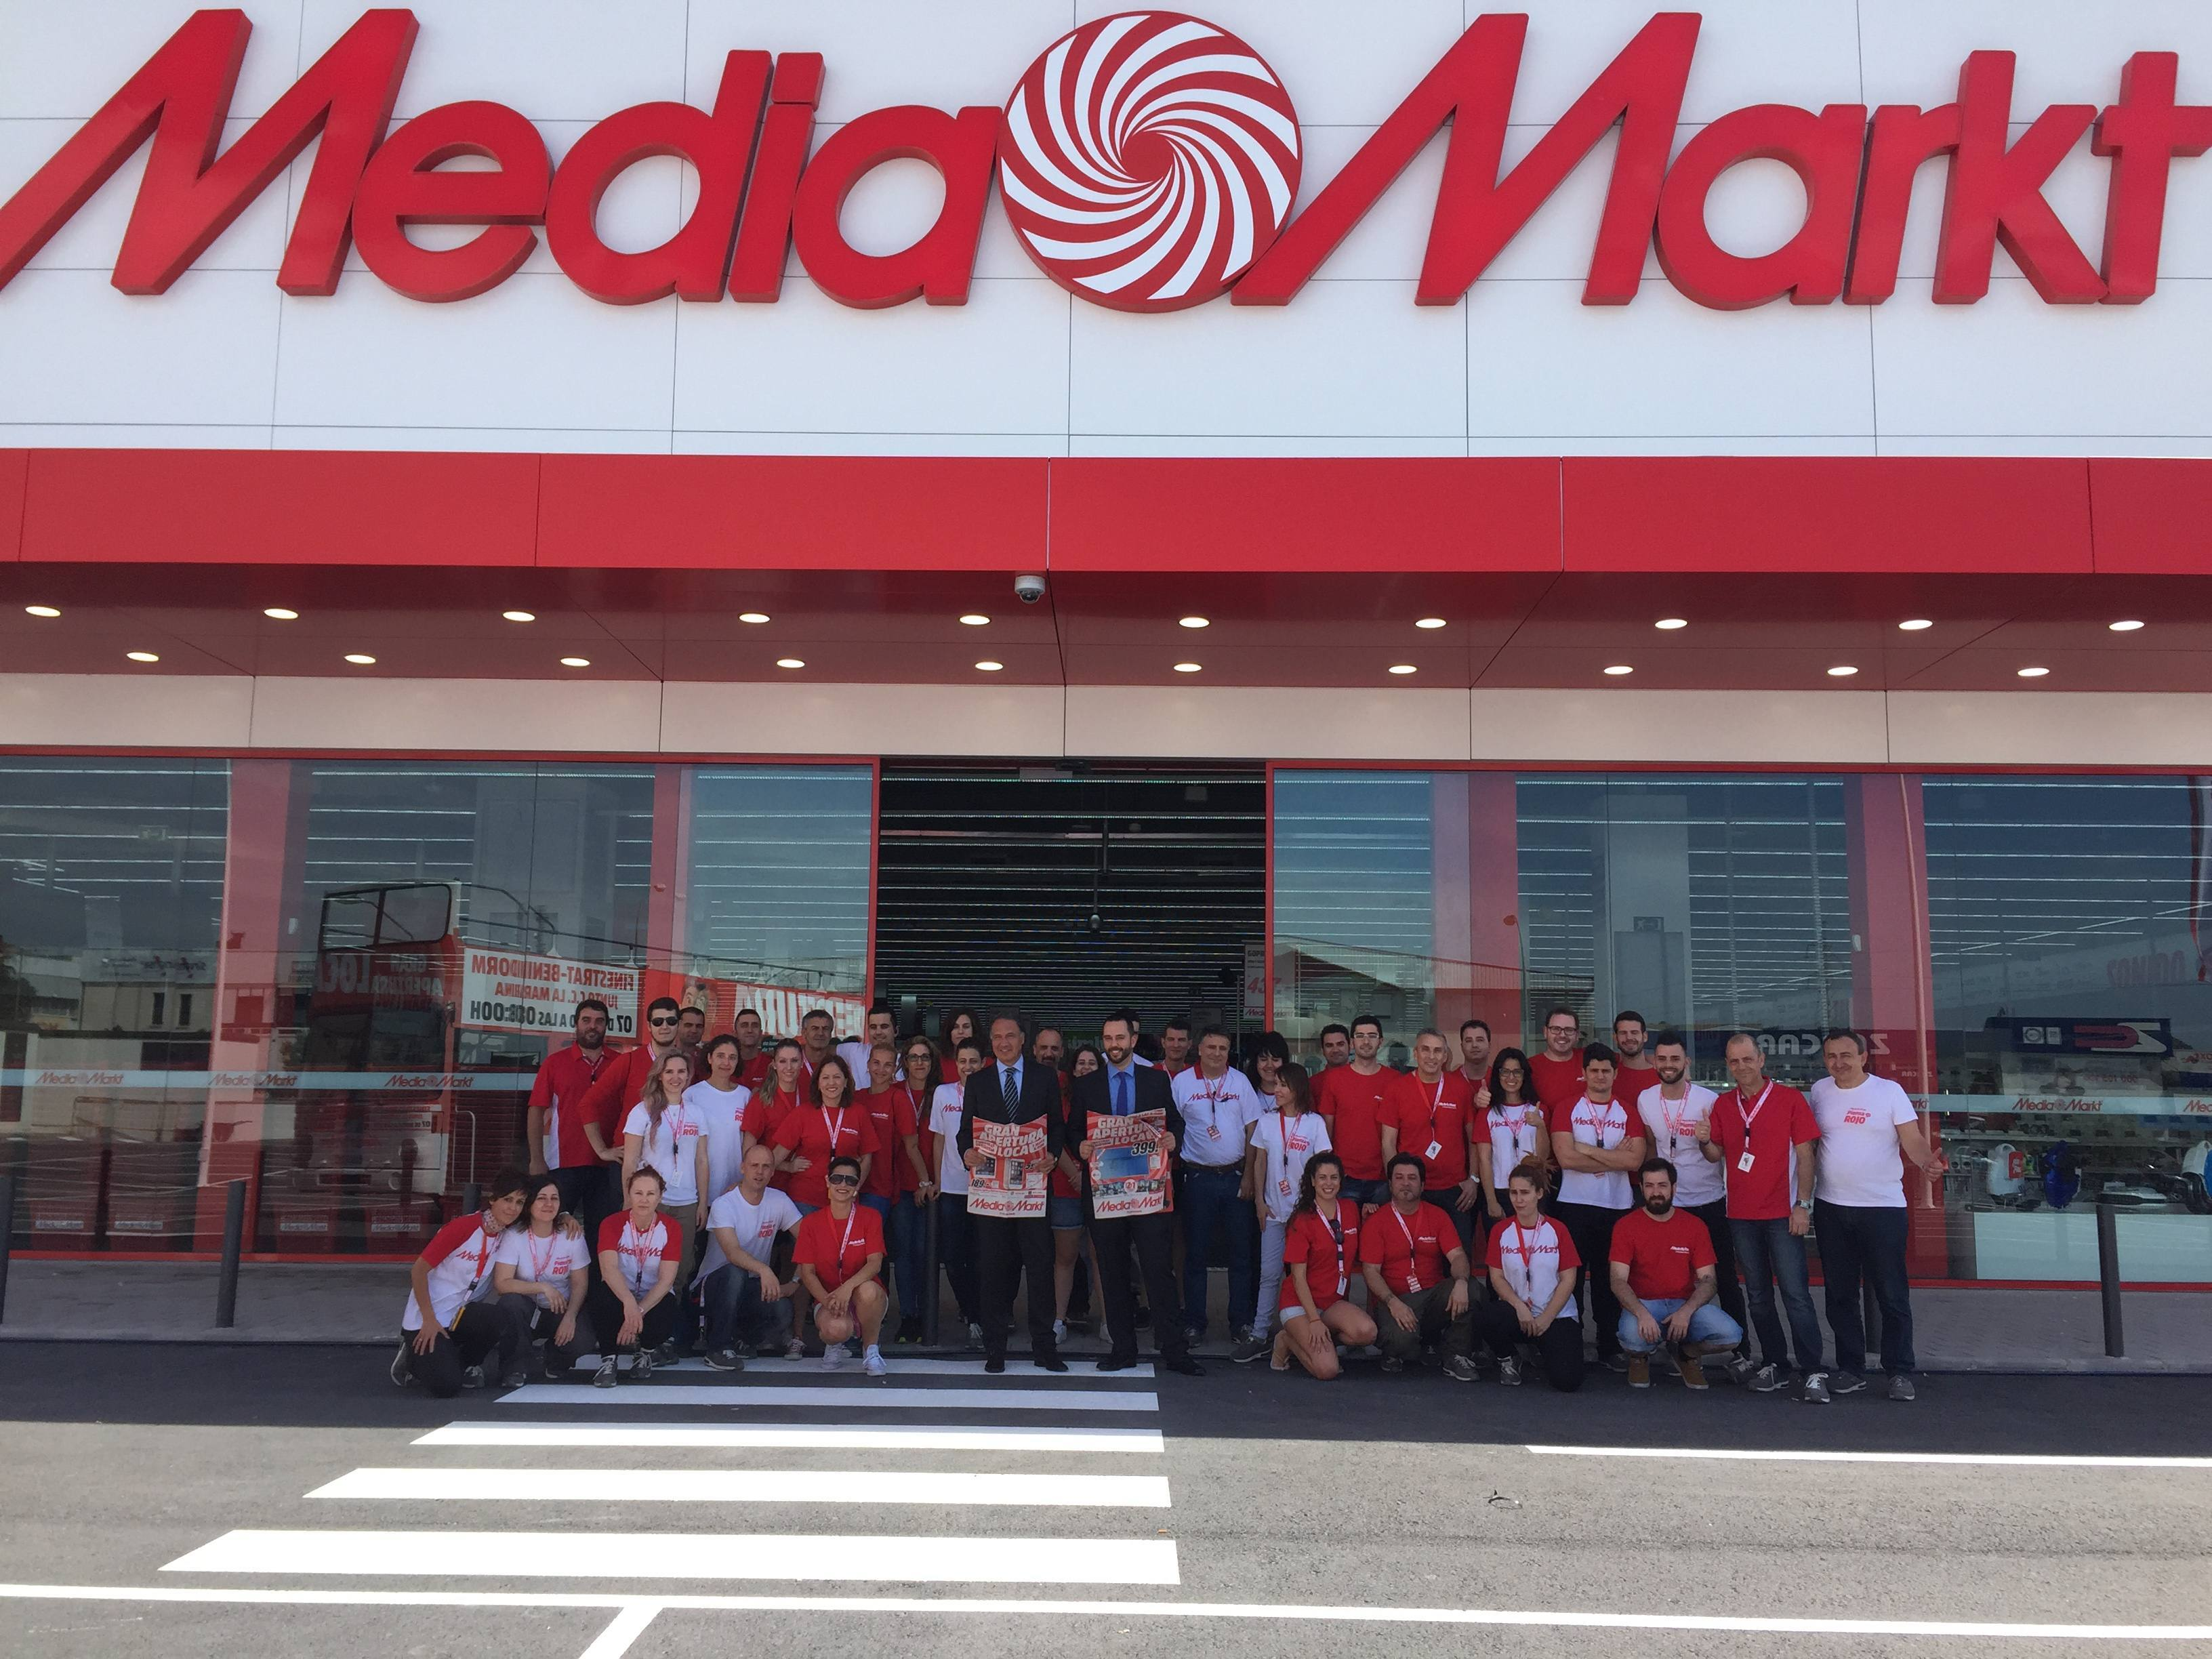 mediamarkt IMG 9192 (1) Tienda ... 0d4b8a2e8ed